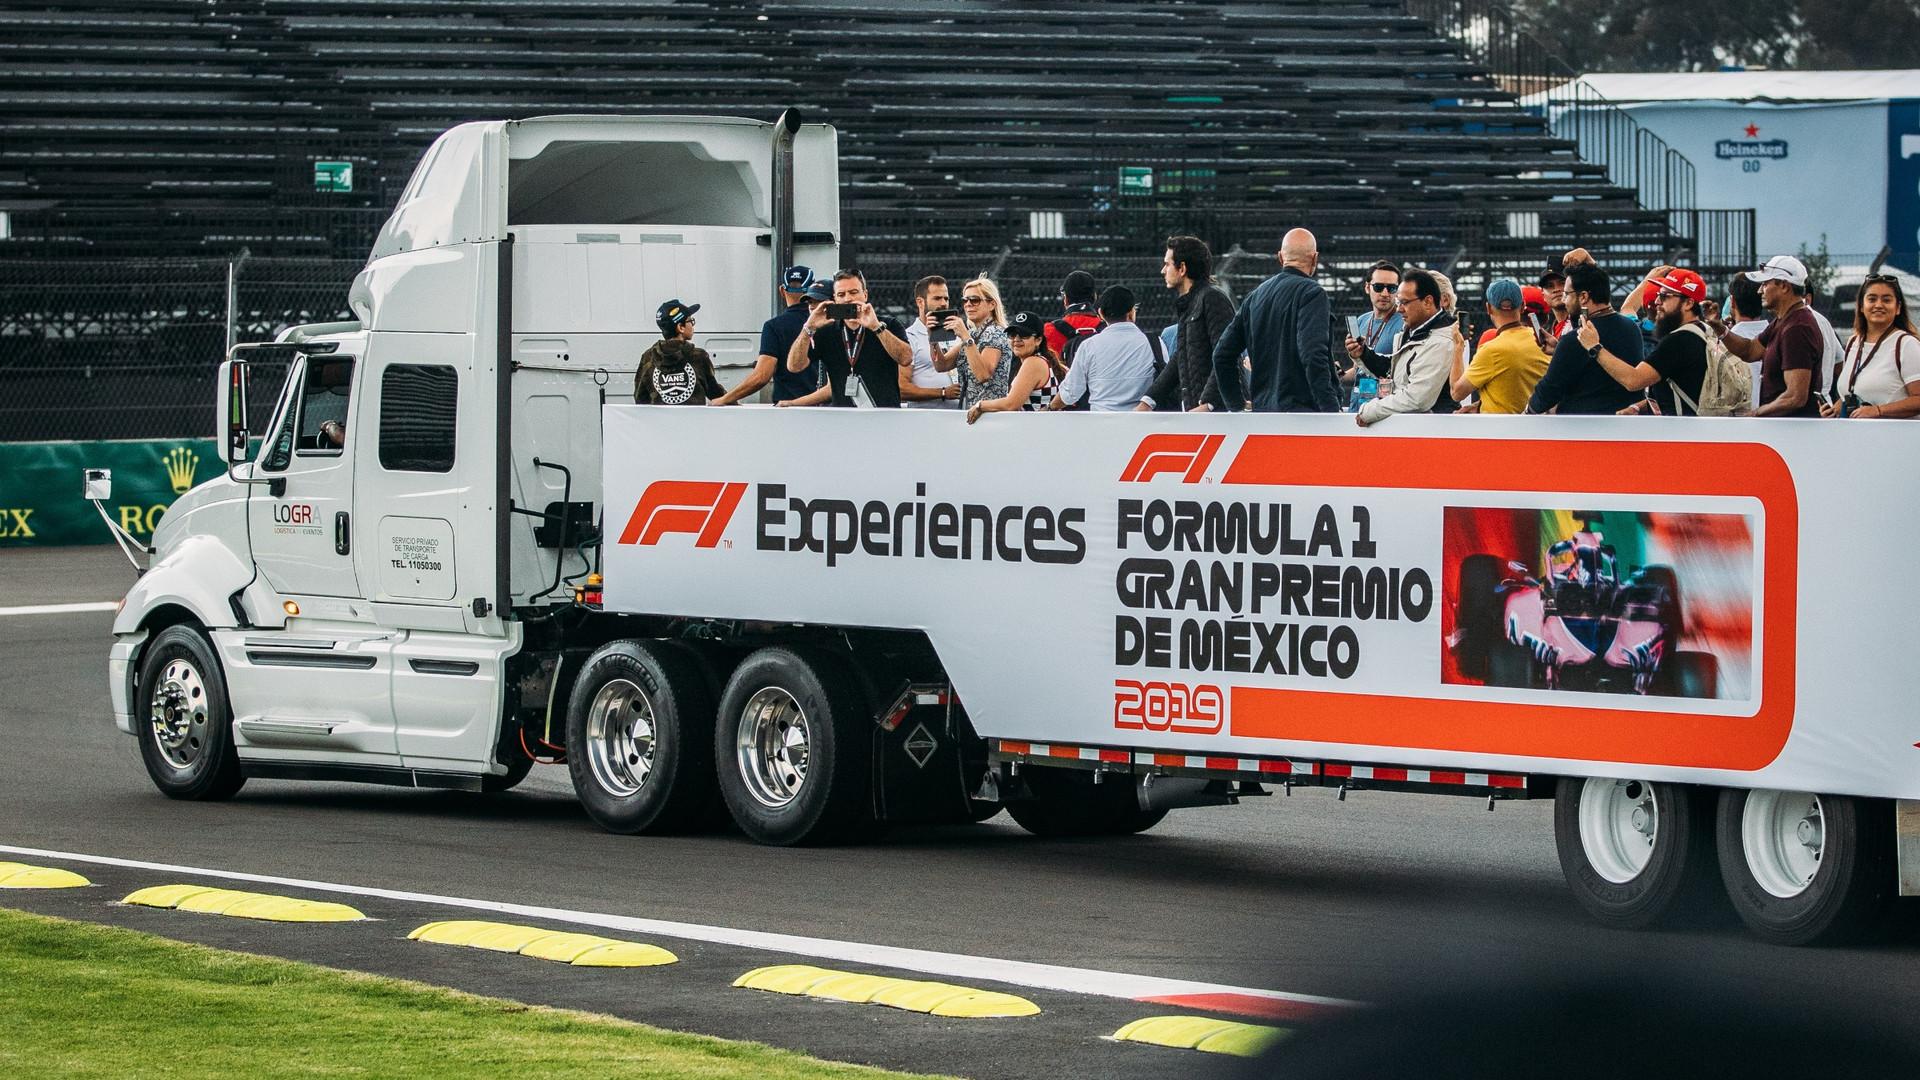 f1 experiences x 16k agency